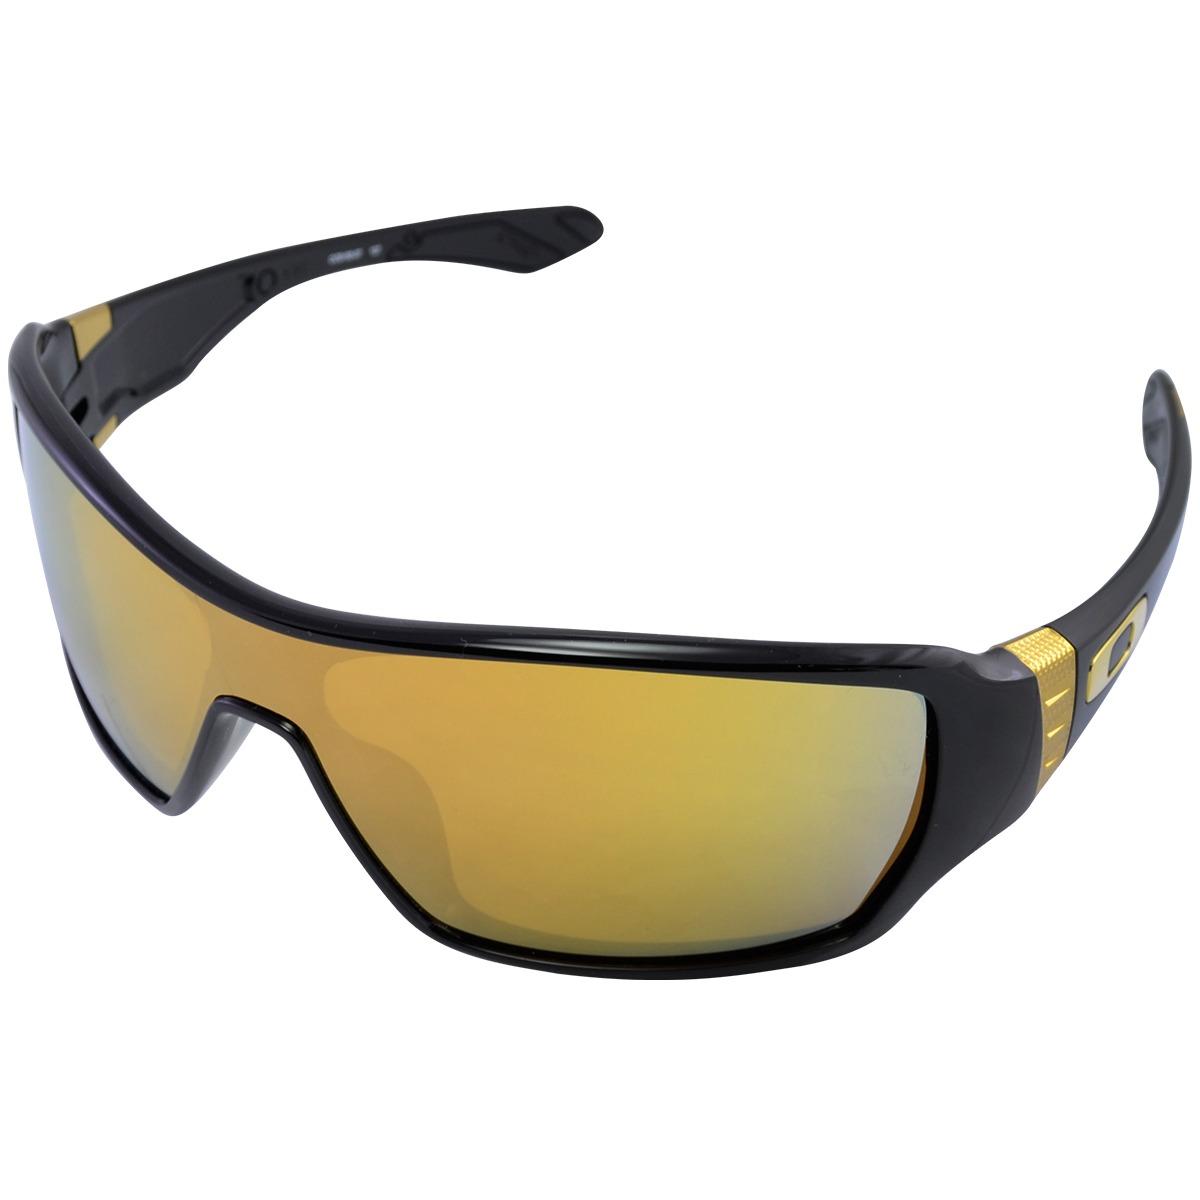 11230a083e711 óculos oakley offshoot. Carregando zoom.